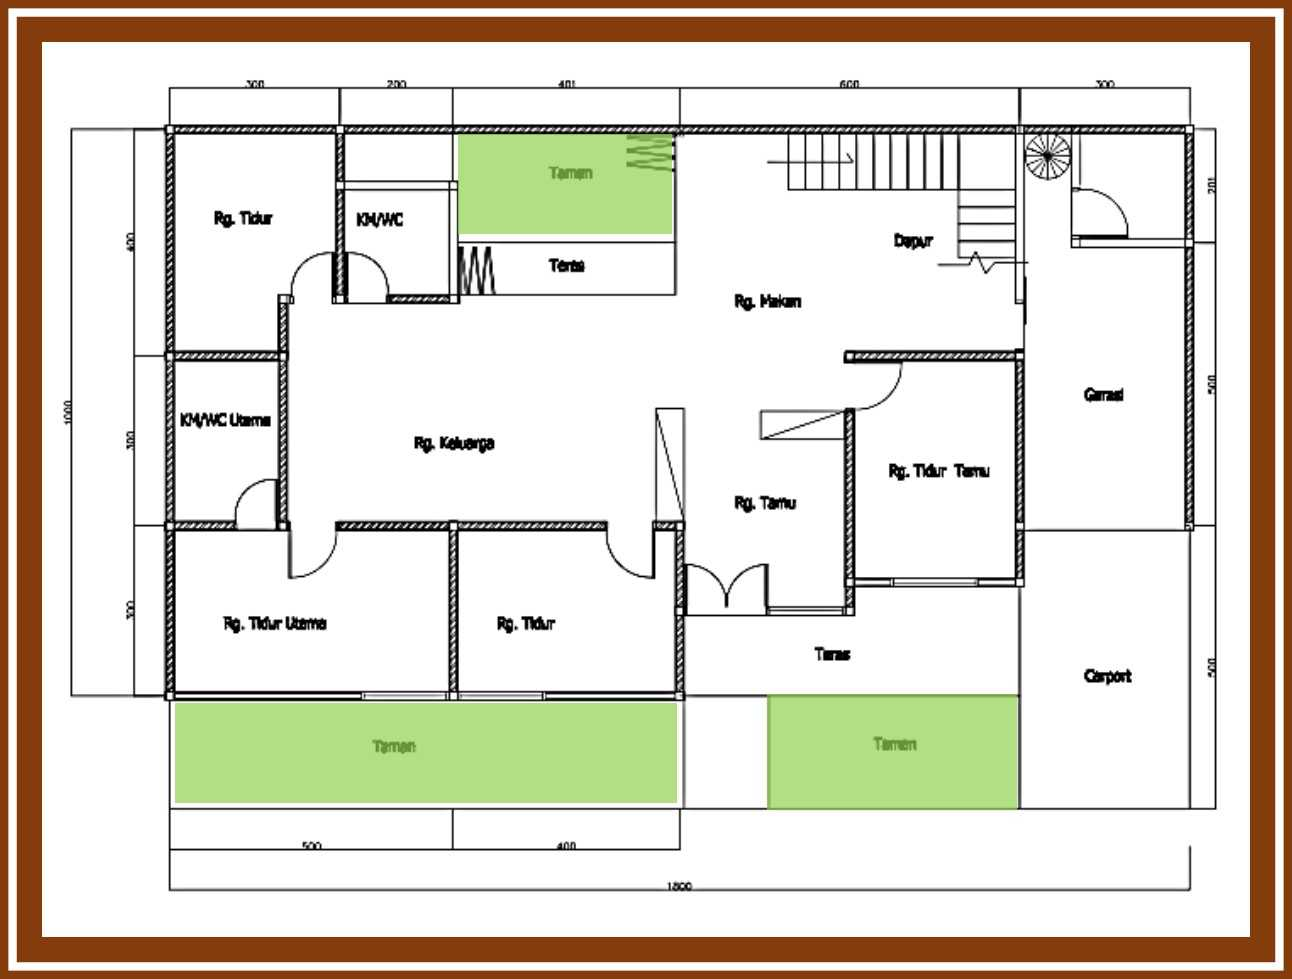 Ideall Design Renovasi Rumah Mezzanine Kec. Pondokgede, Kota Bks, Jawa Barat, Indonesia Kec. Pondokgede, Kota Bks, Jawa Barat, Indonesia Denah Rumah  114414